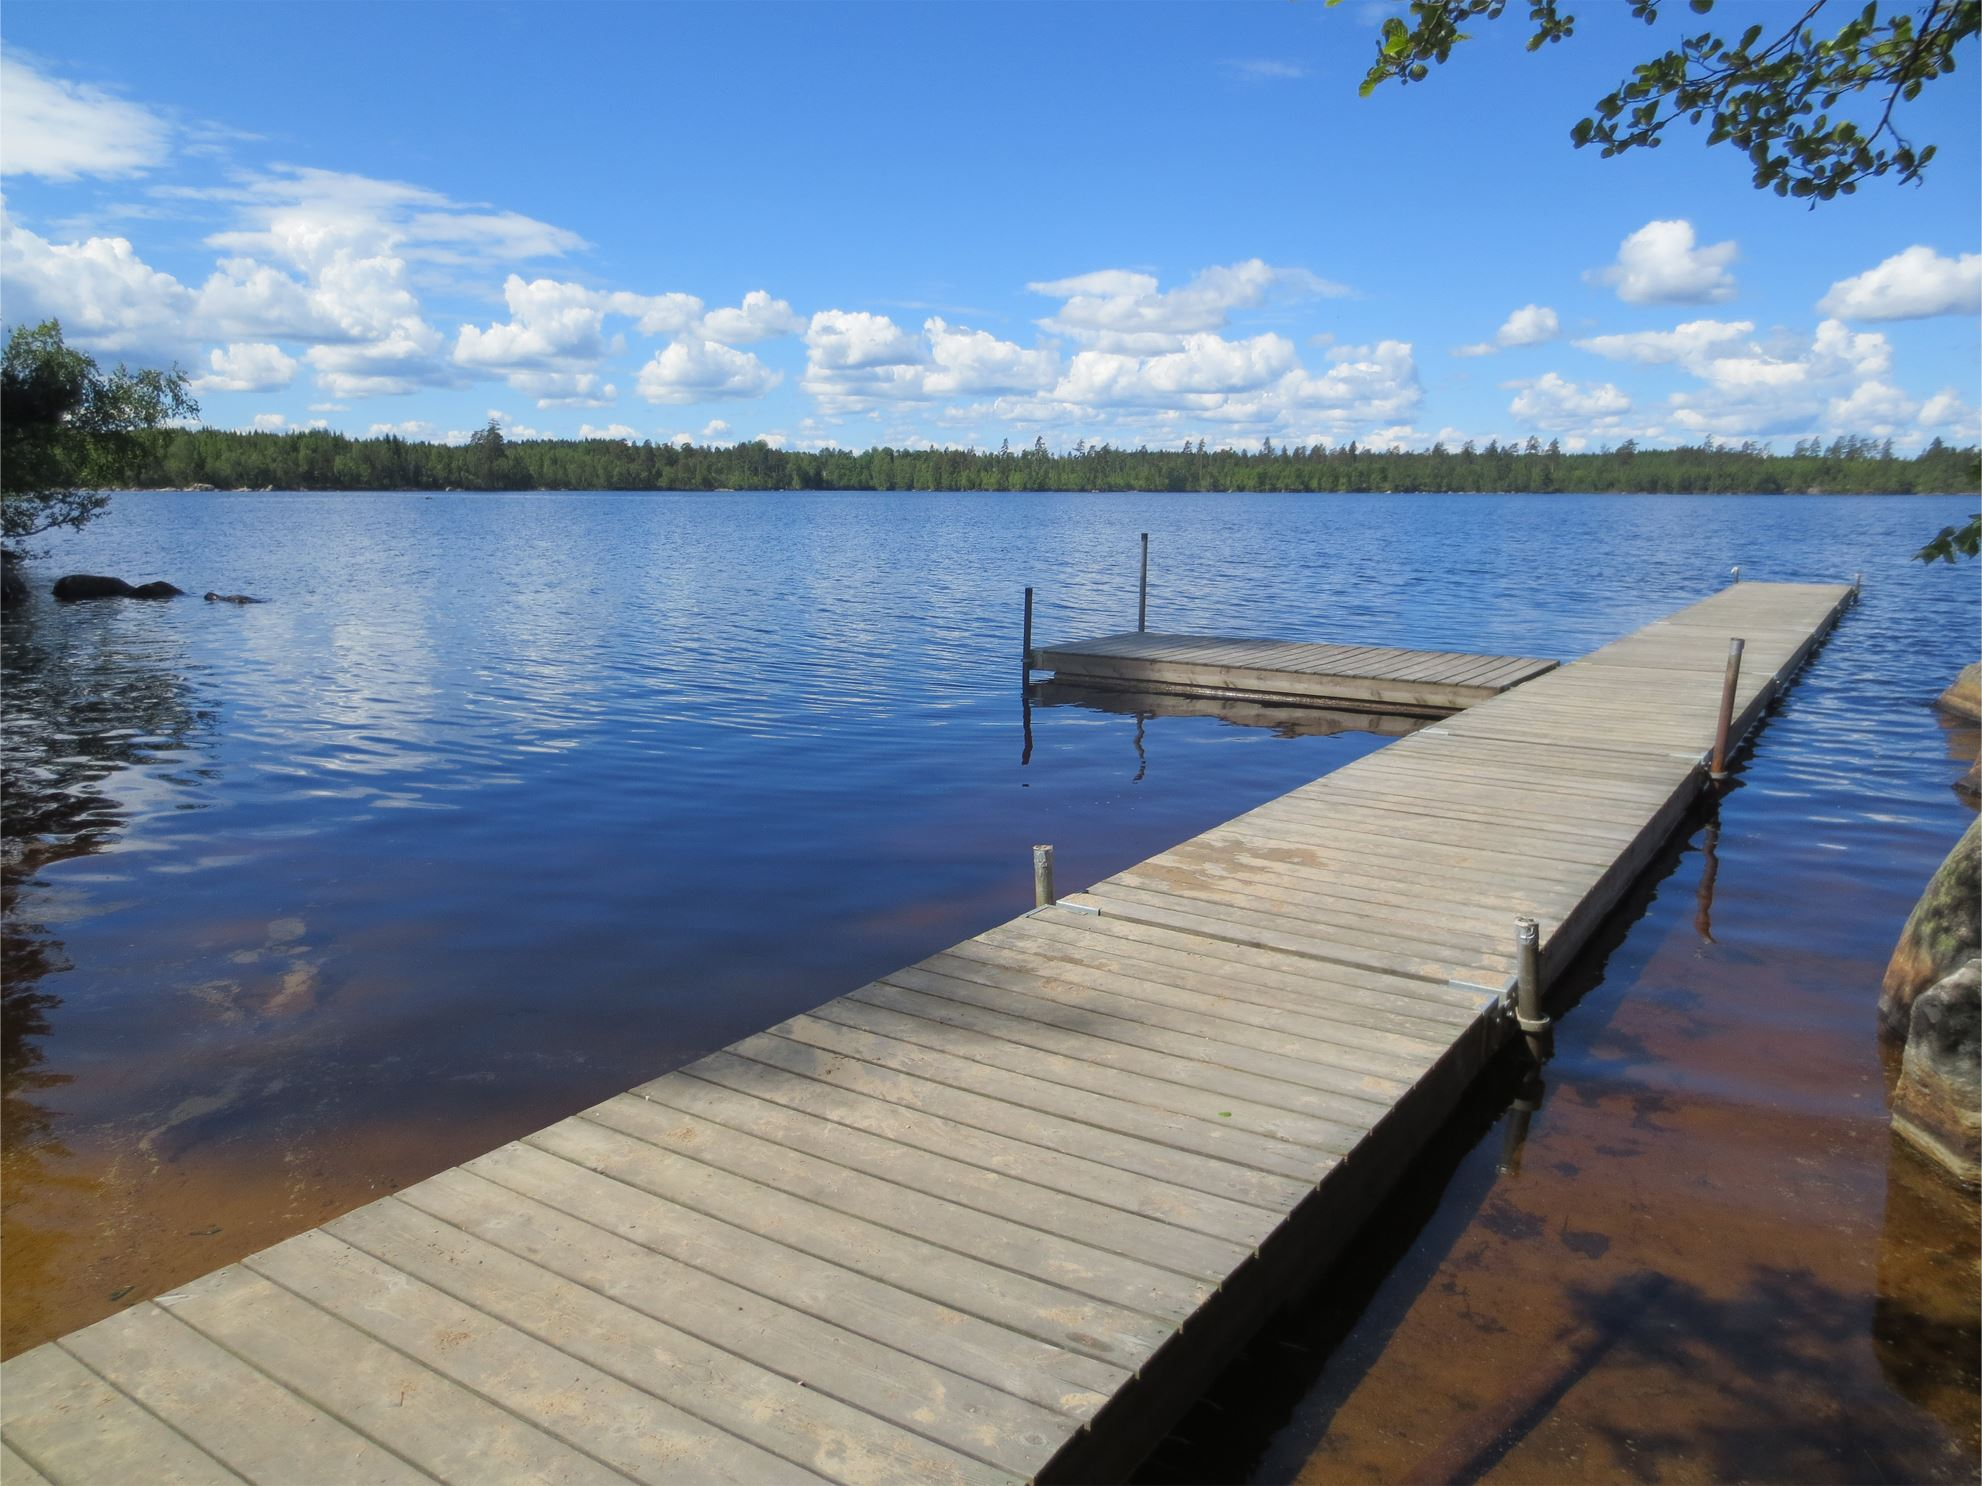 Badplats Festplatsen Madsjön